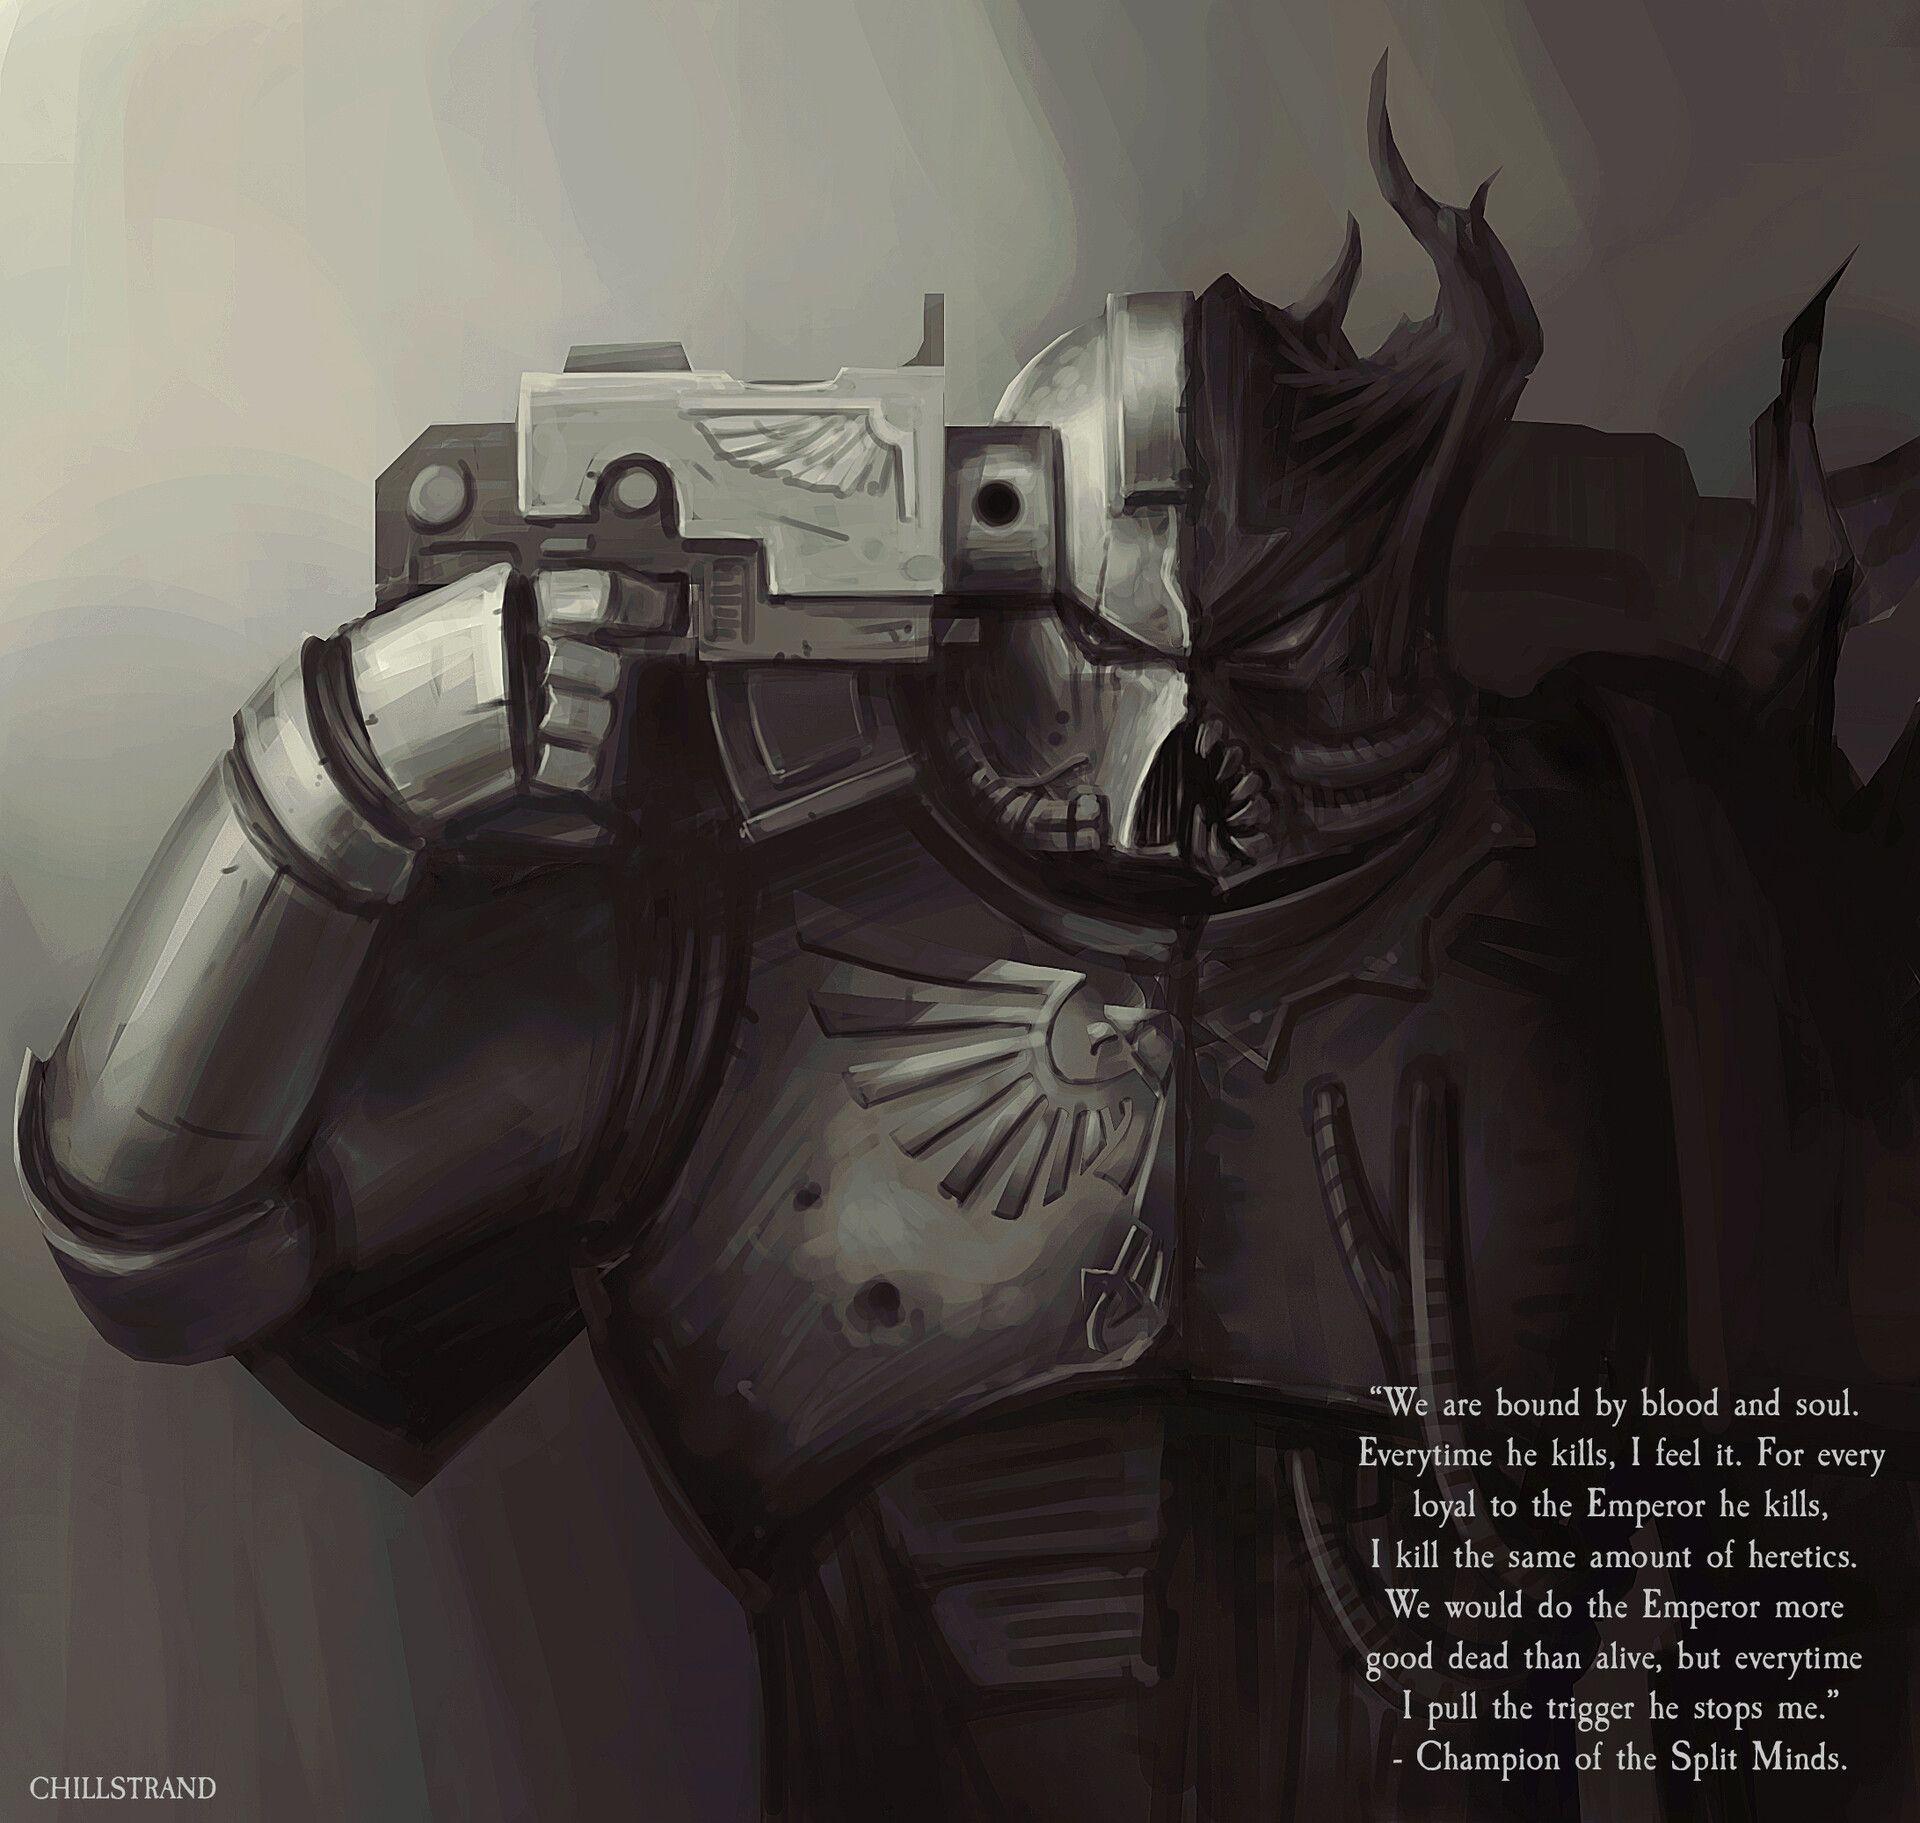 Warhammer 40000 Split Minds By Mikael Kihlstrand Warhammer Warhammer 40k Memes Warhammer 40k